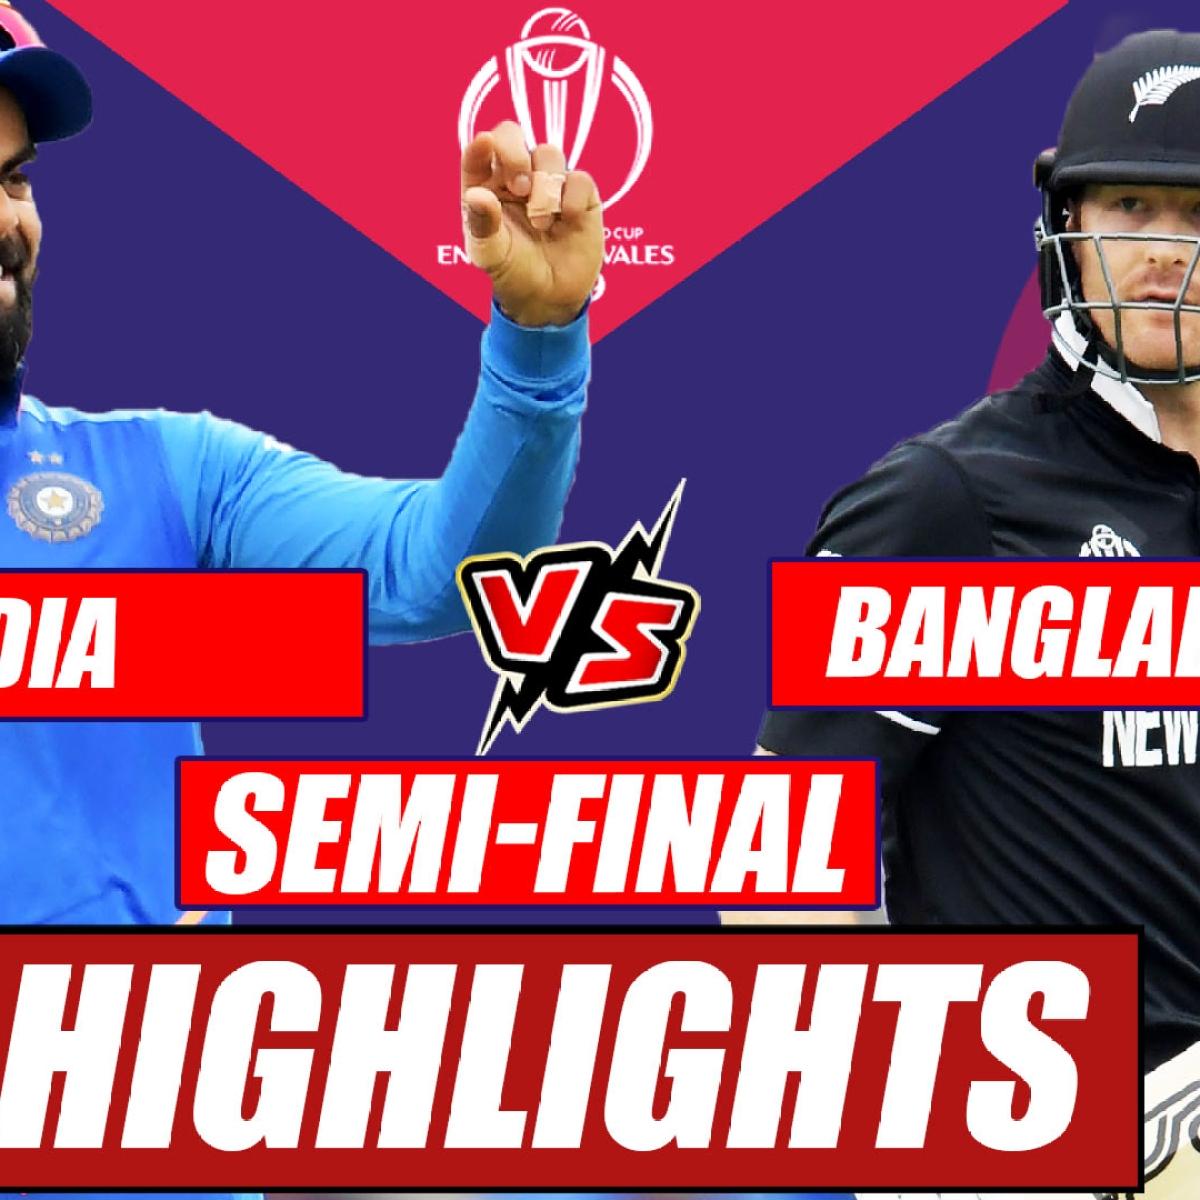 India vs New Zealand World Cup 2019 Semi-Final At Manchester | Match Highlights So Far